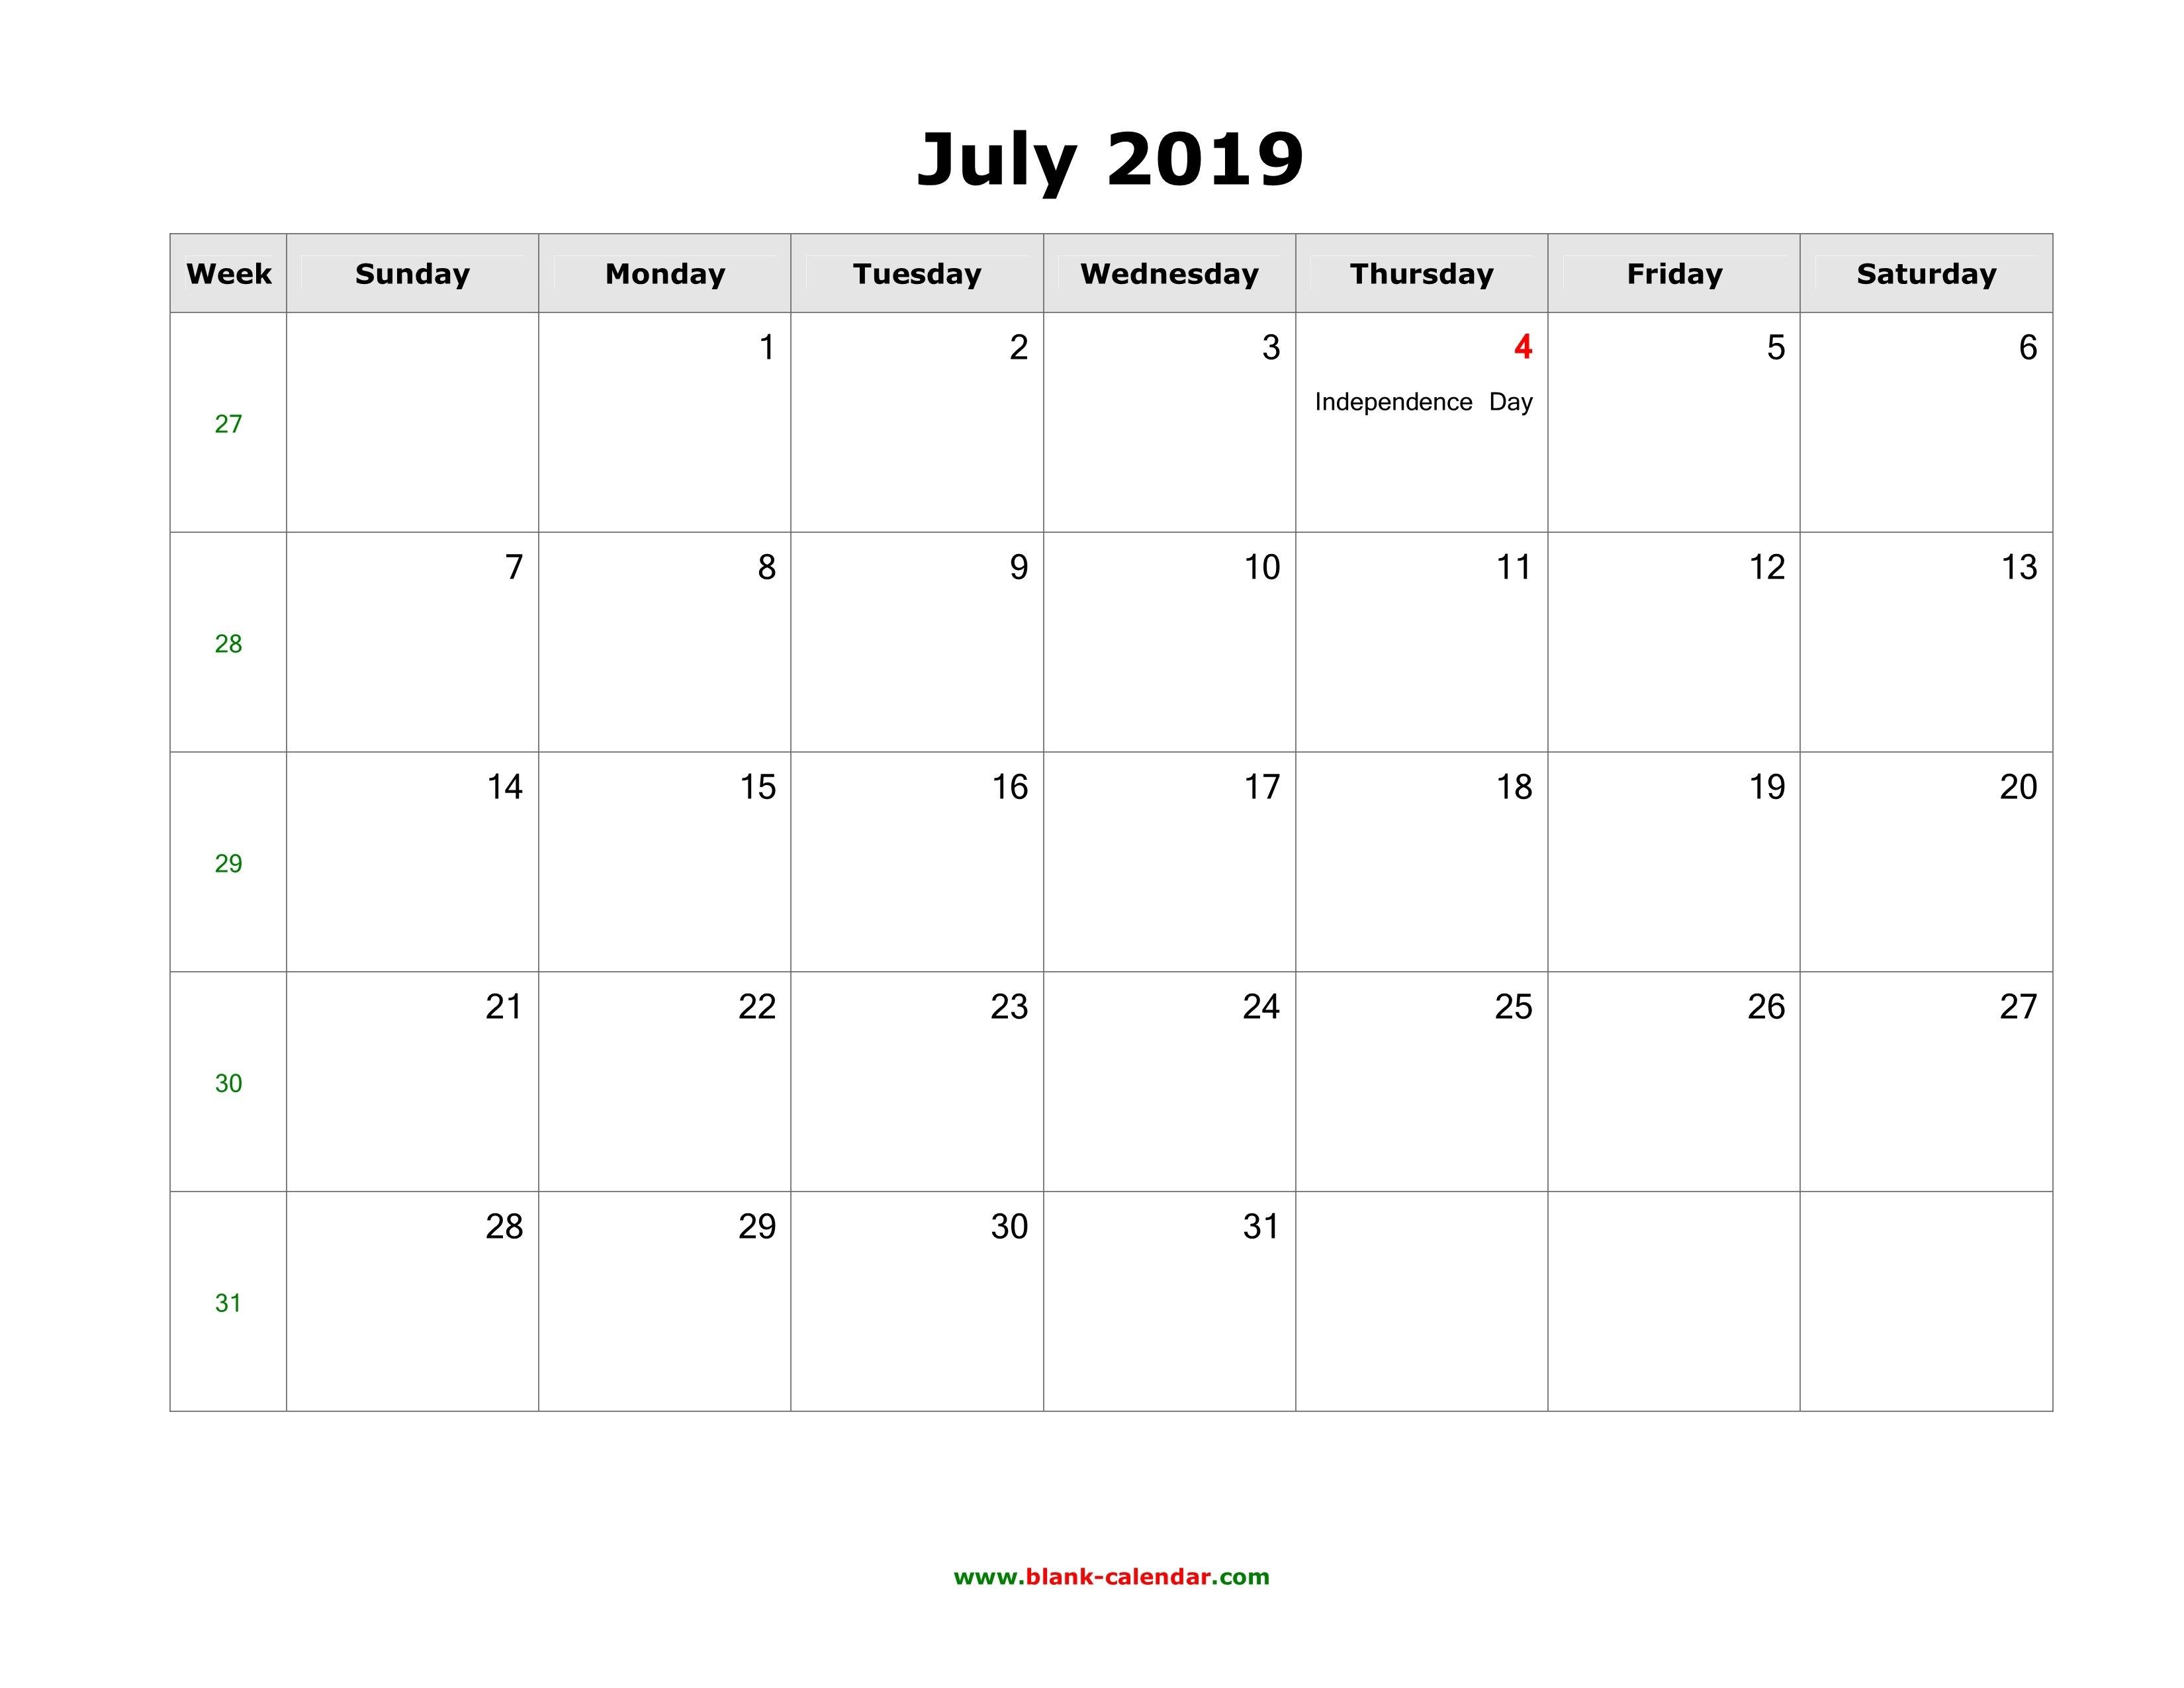 Download July 2019 Blank Calendar With Us Holidays (Horizontal) July 2 2019 Calendar